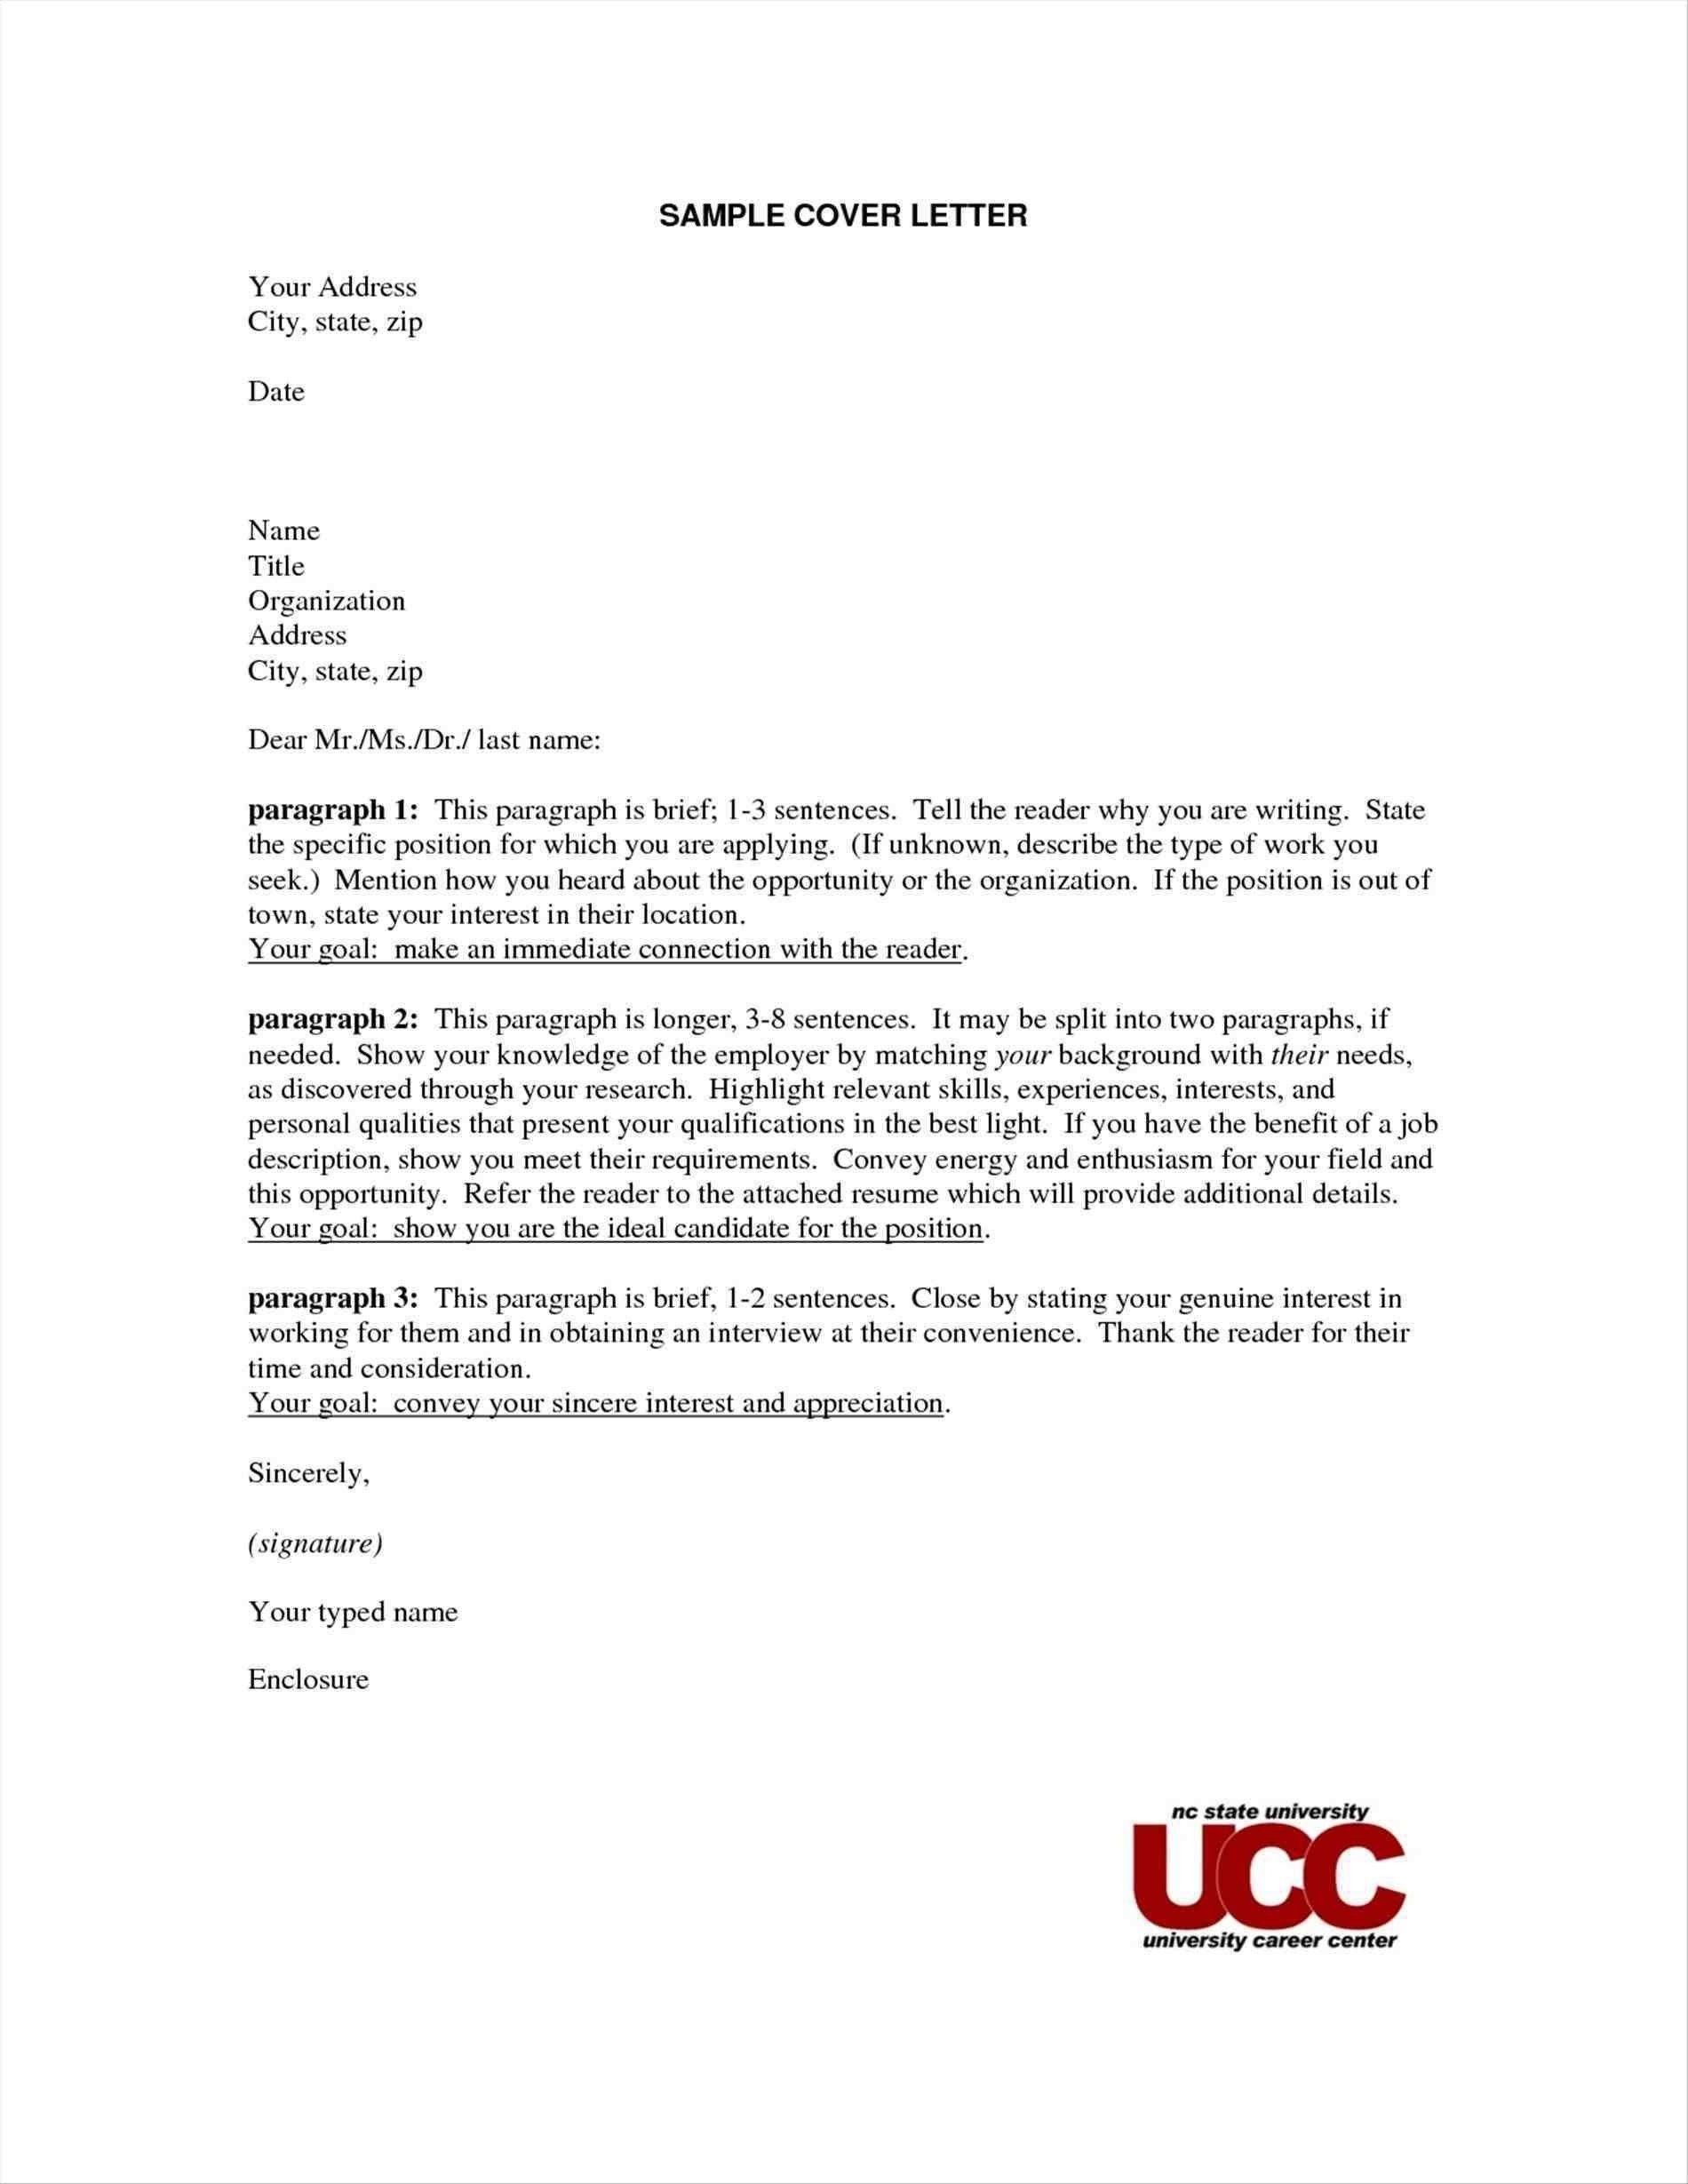 Sample Cover Letter Name